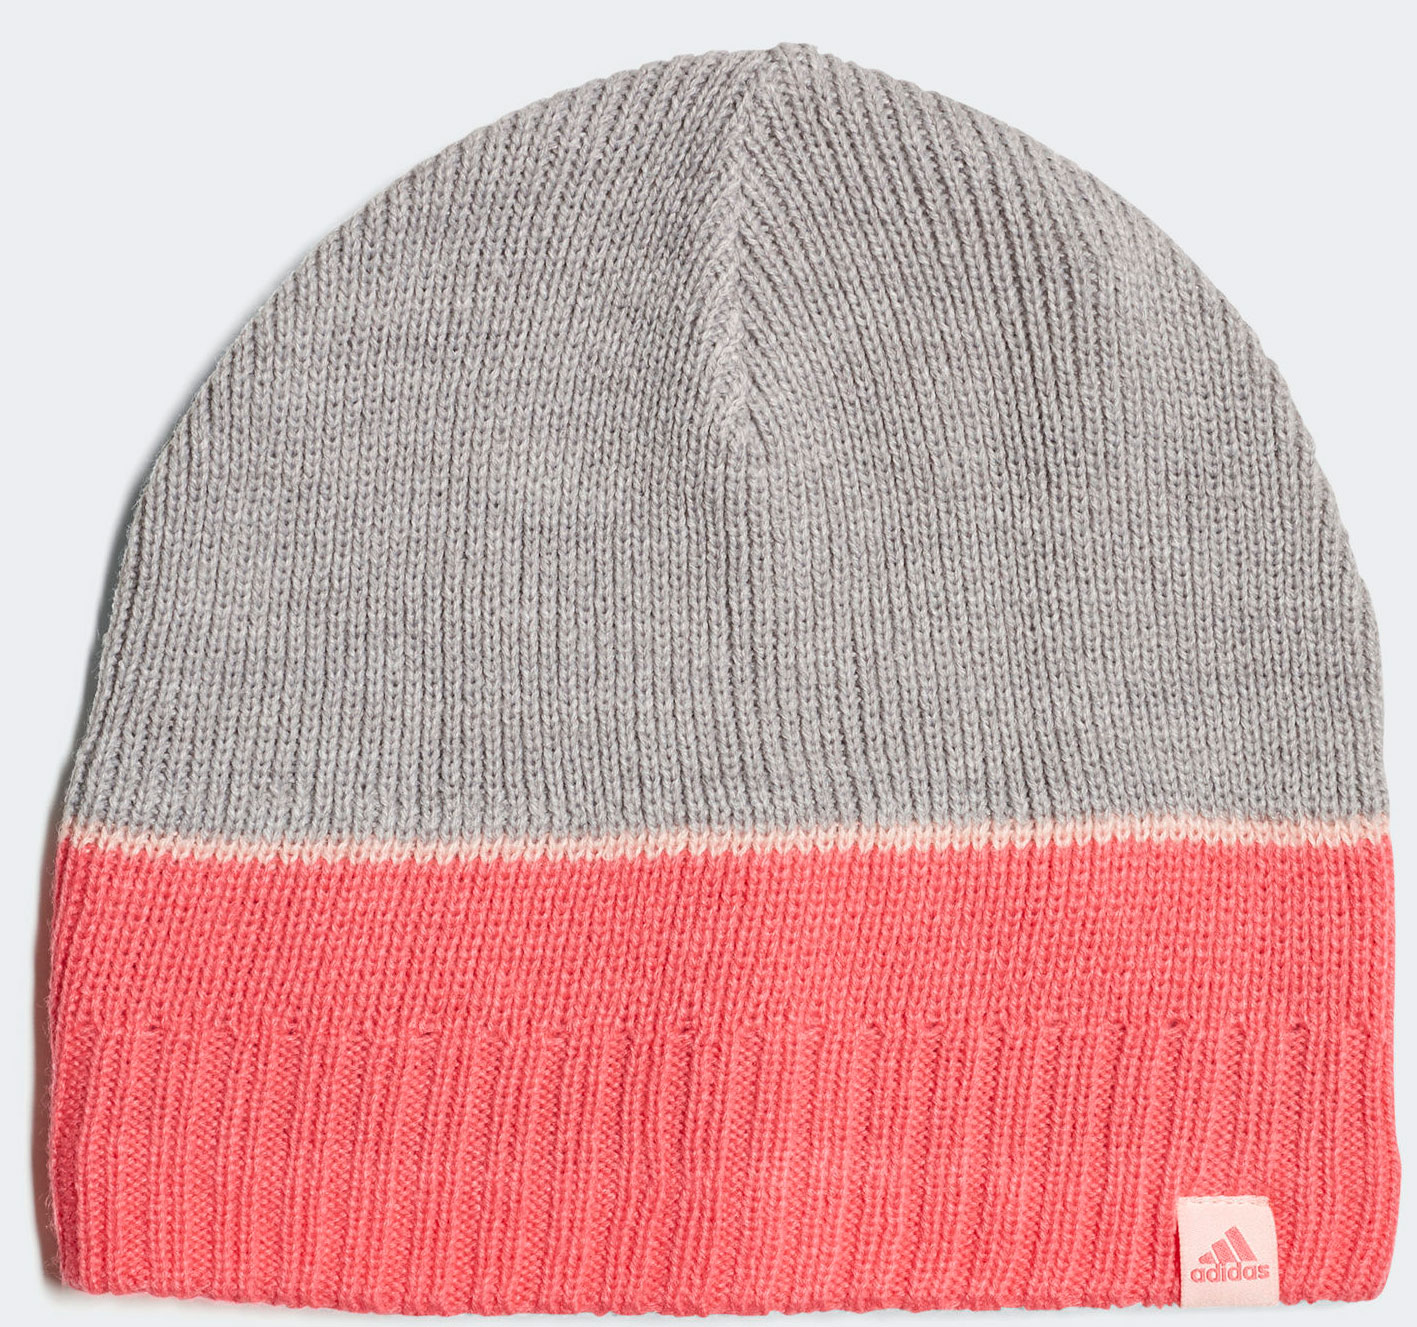 Фото - Шапка adidas Stripy Beanie шапка мужская adidas tiro beanie цвет черный bq1662 размер 58 60